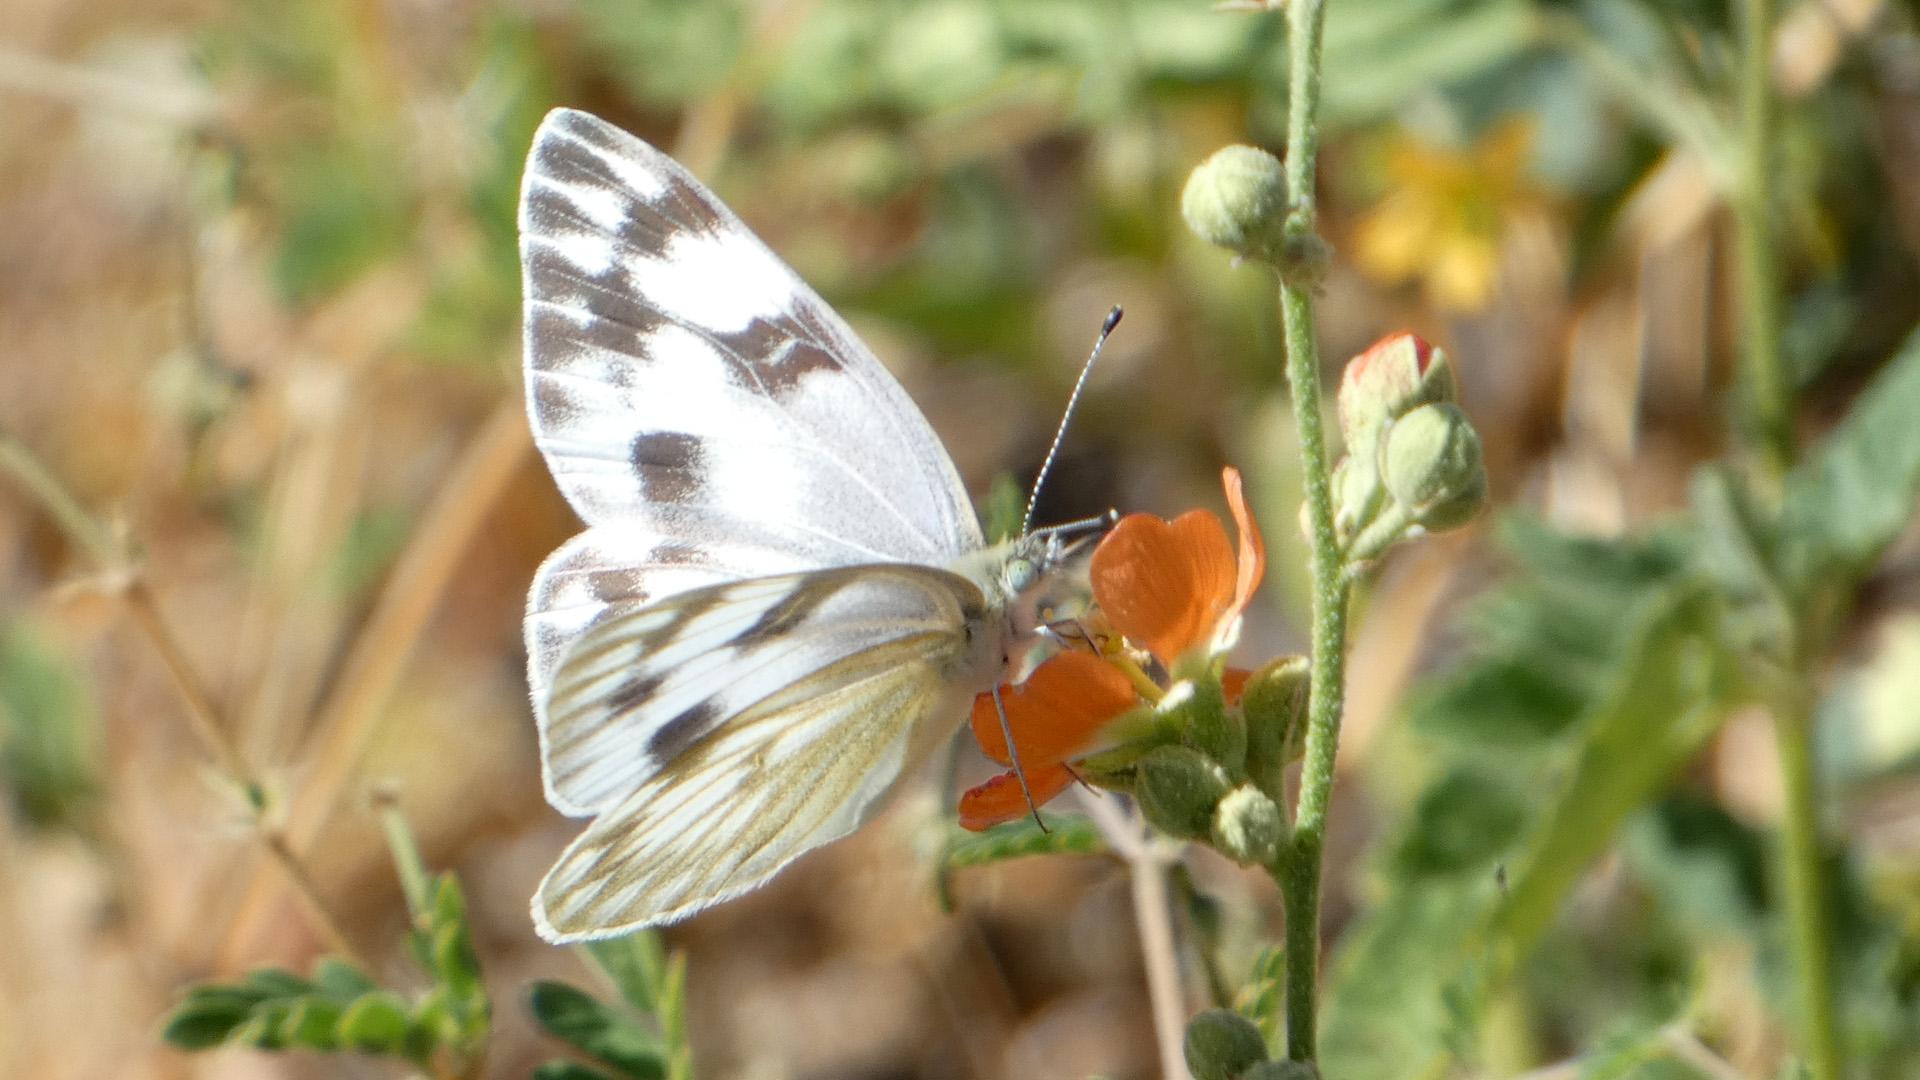 Female, Sandia Mountains west foothills, September 2021